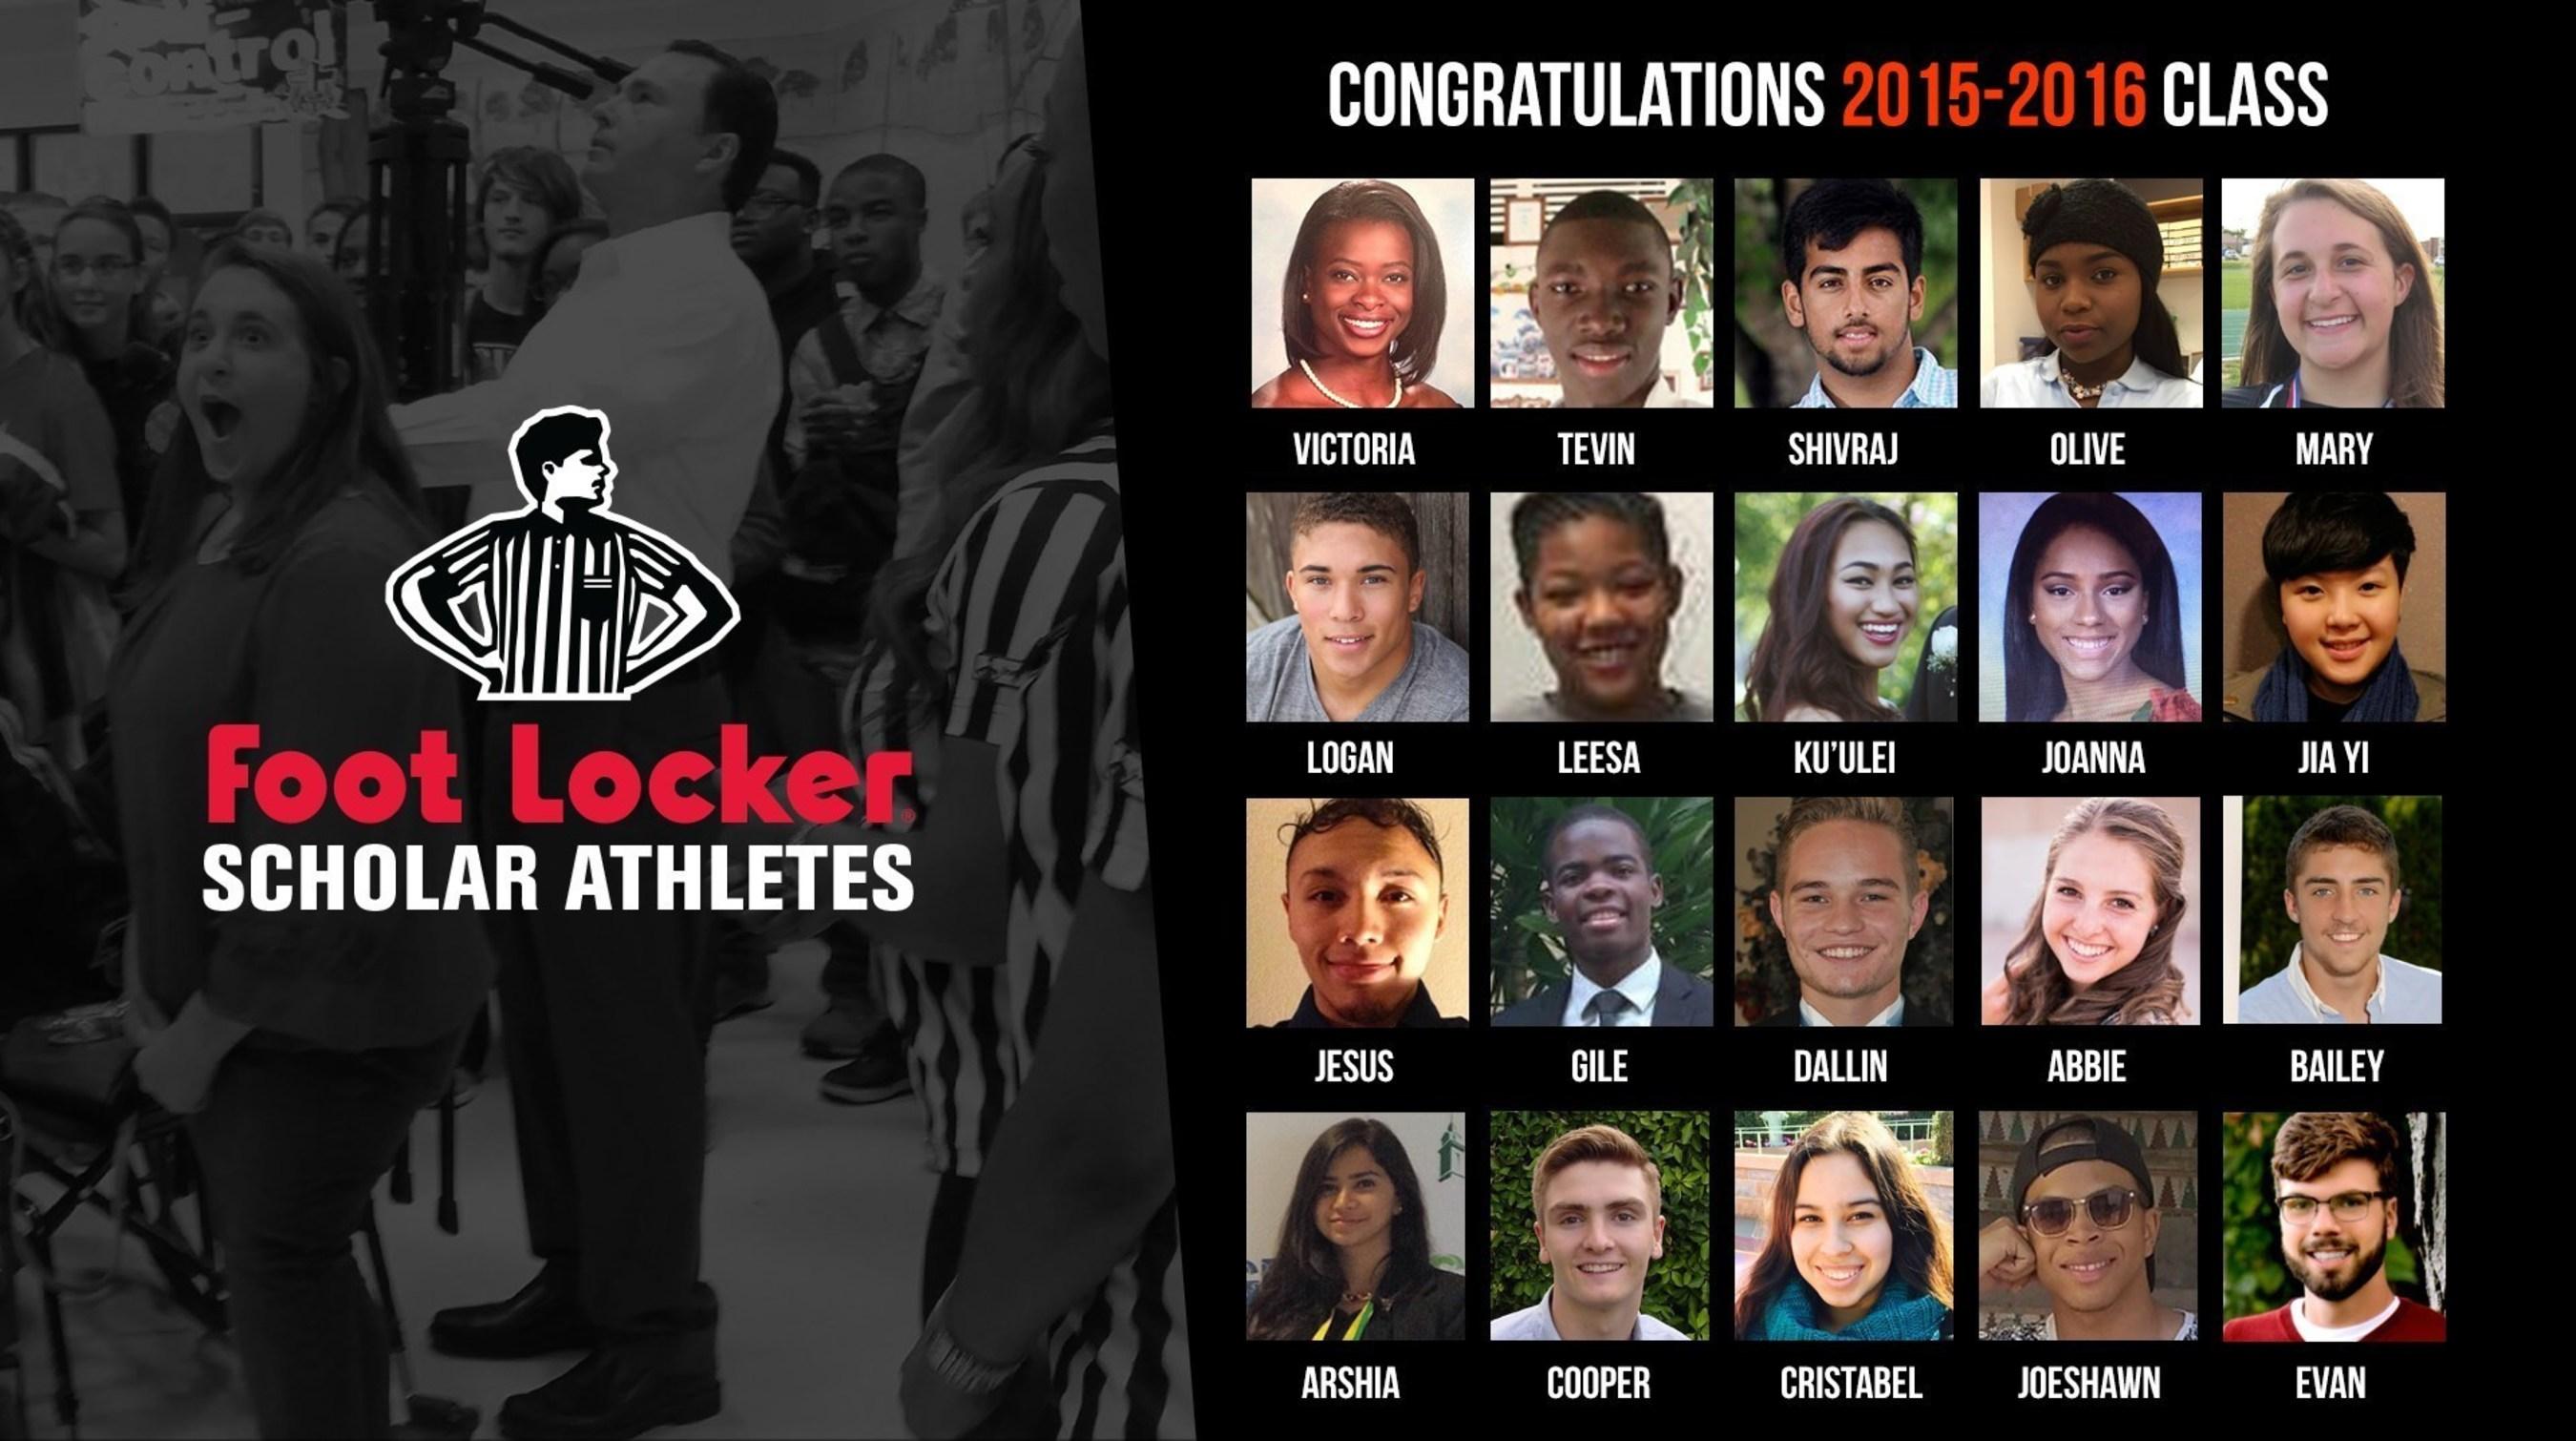 The 2015-2016 Recipients of the $20,000 Foot Locker Scholarship